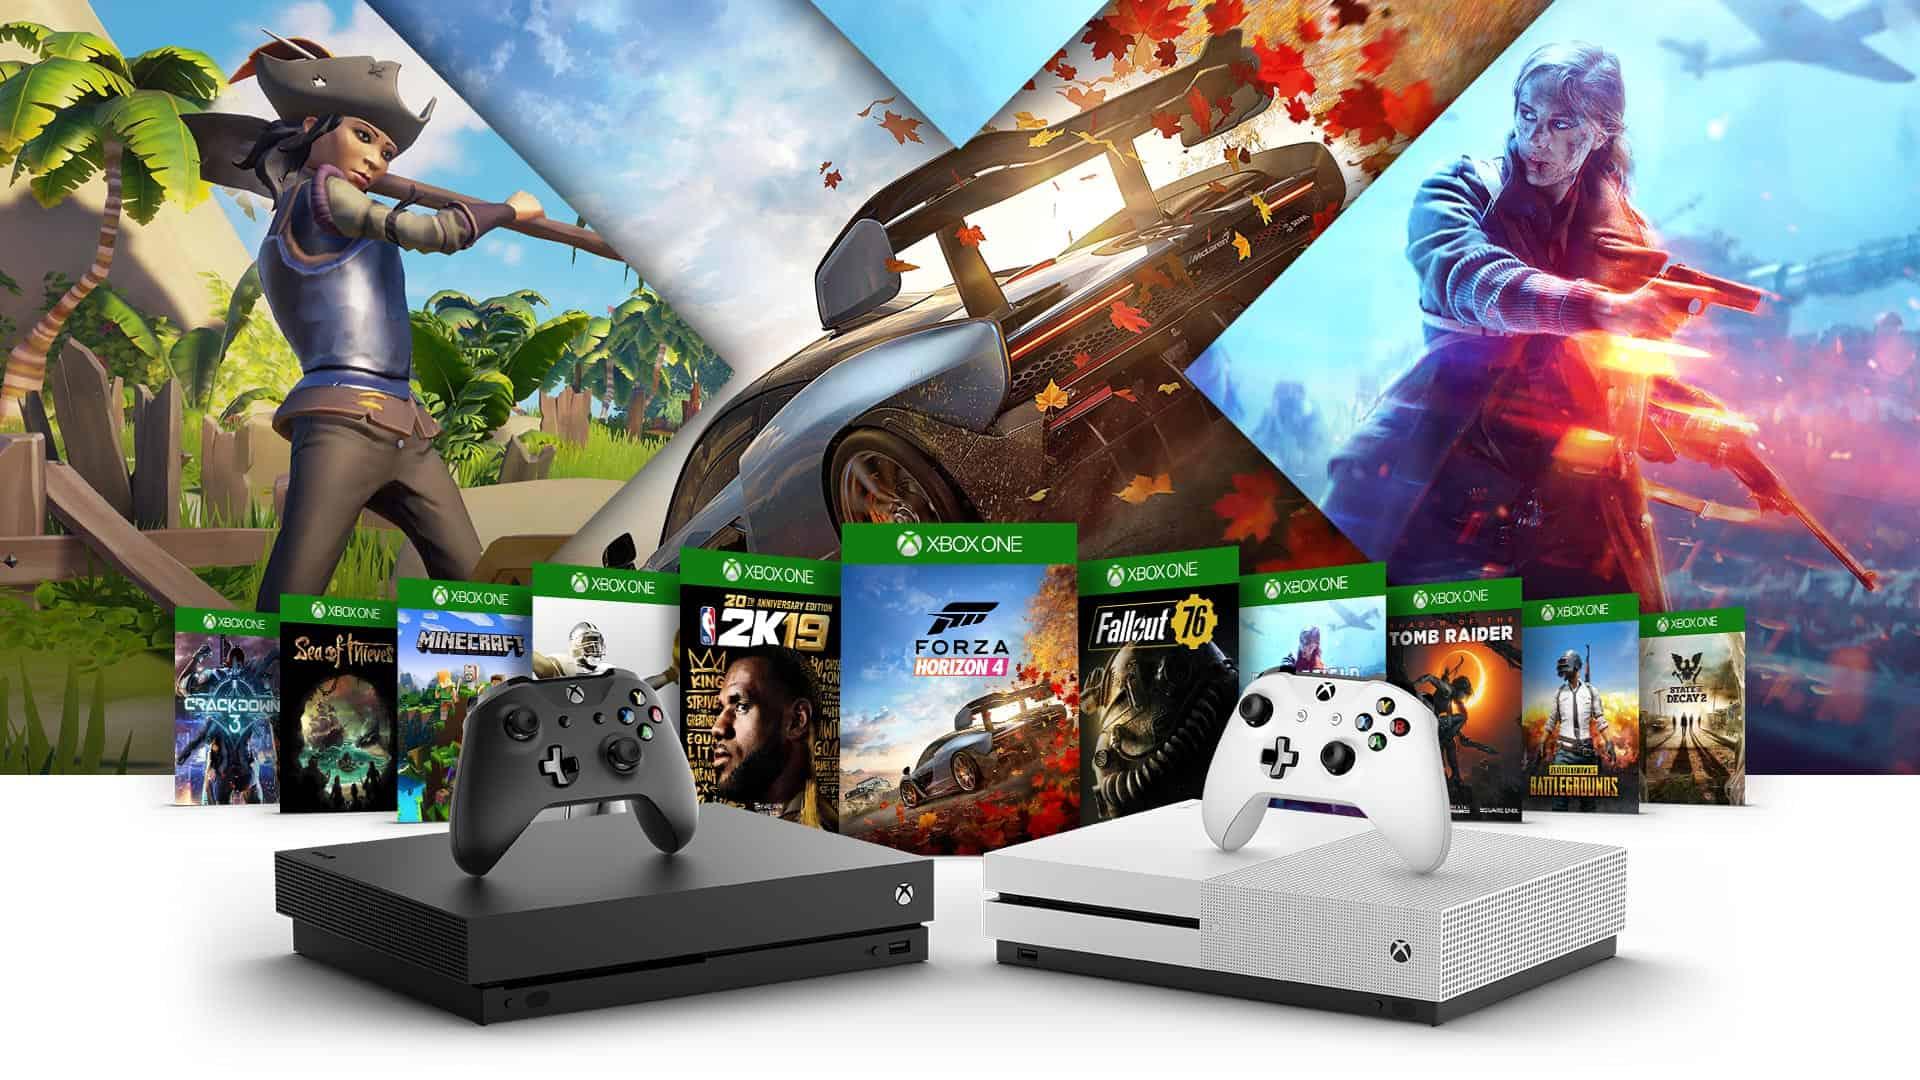 Chơi game Xbox One cùng Console